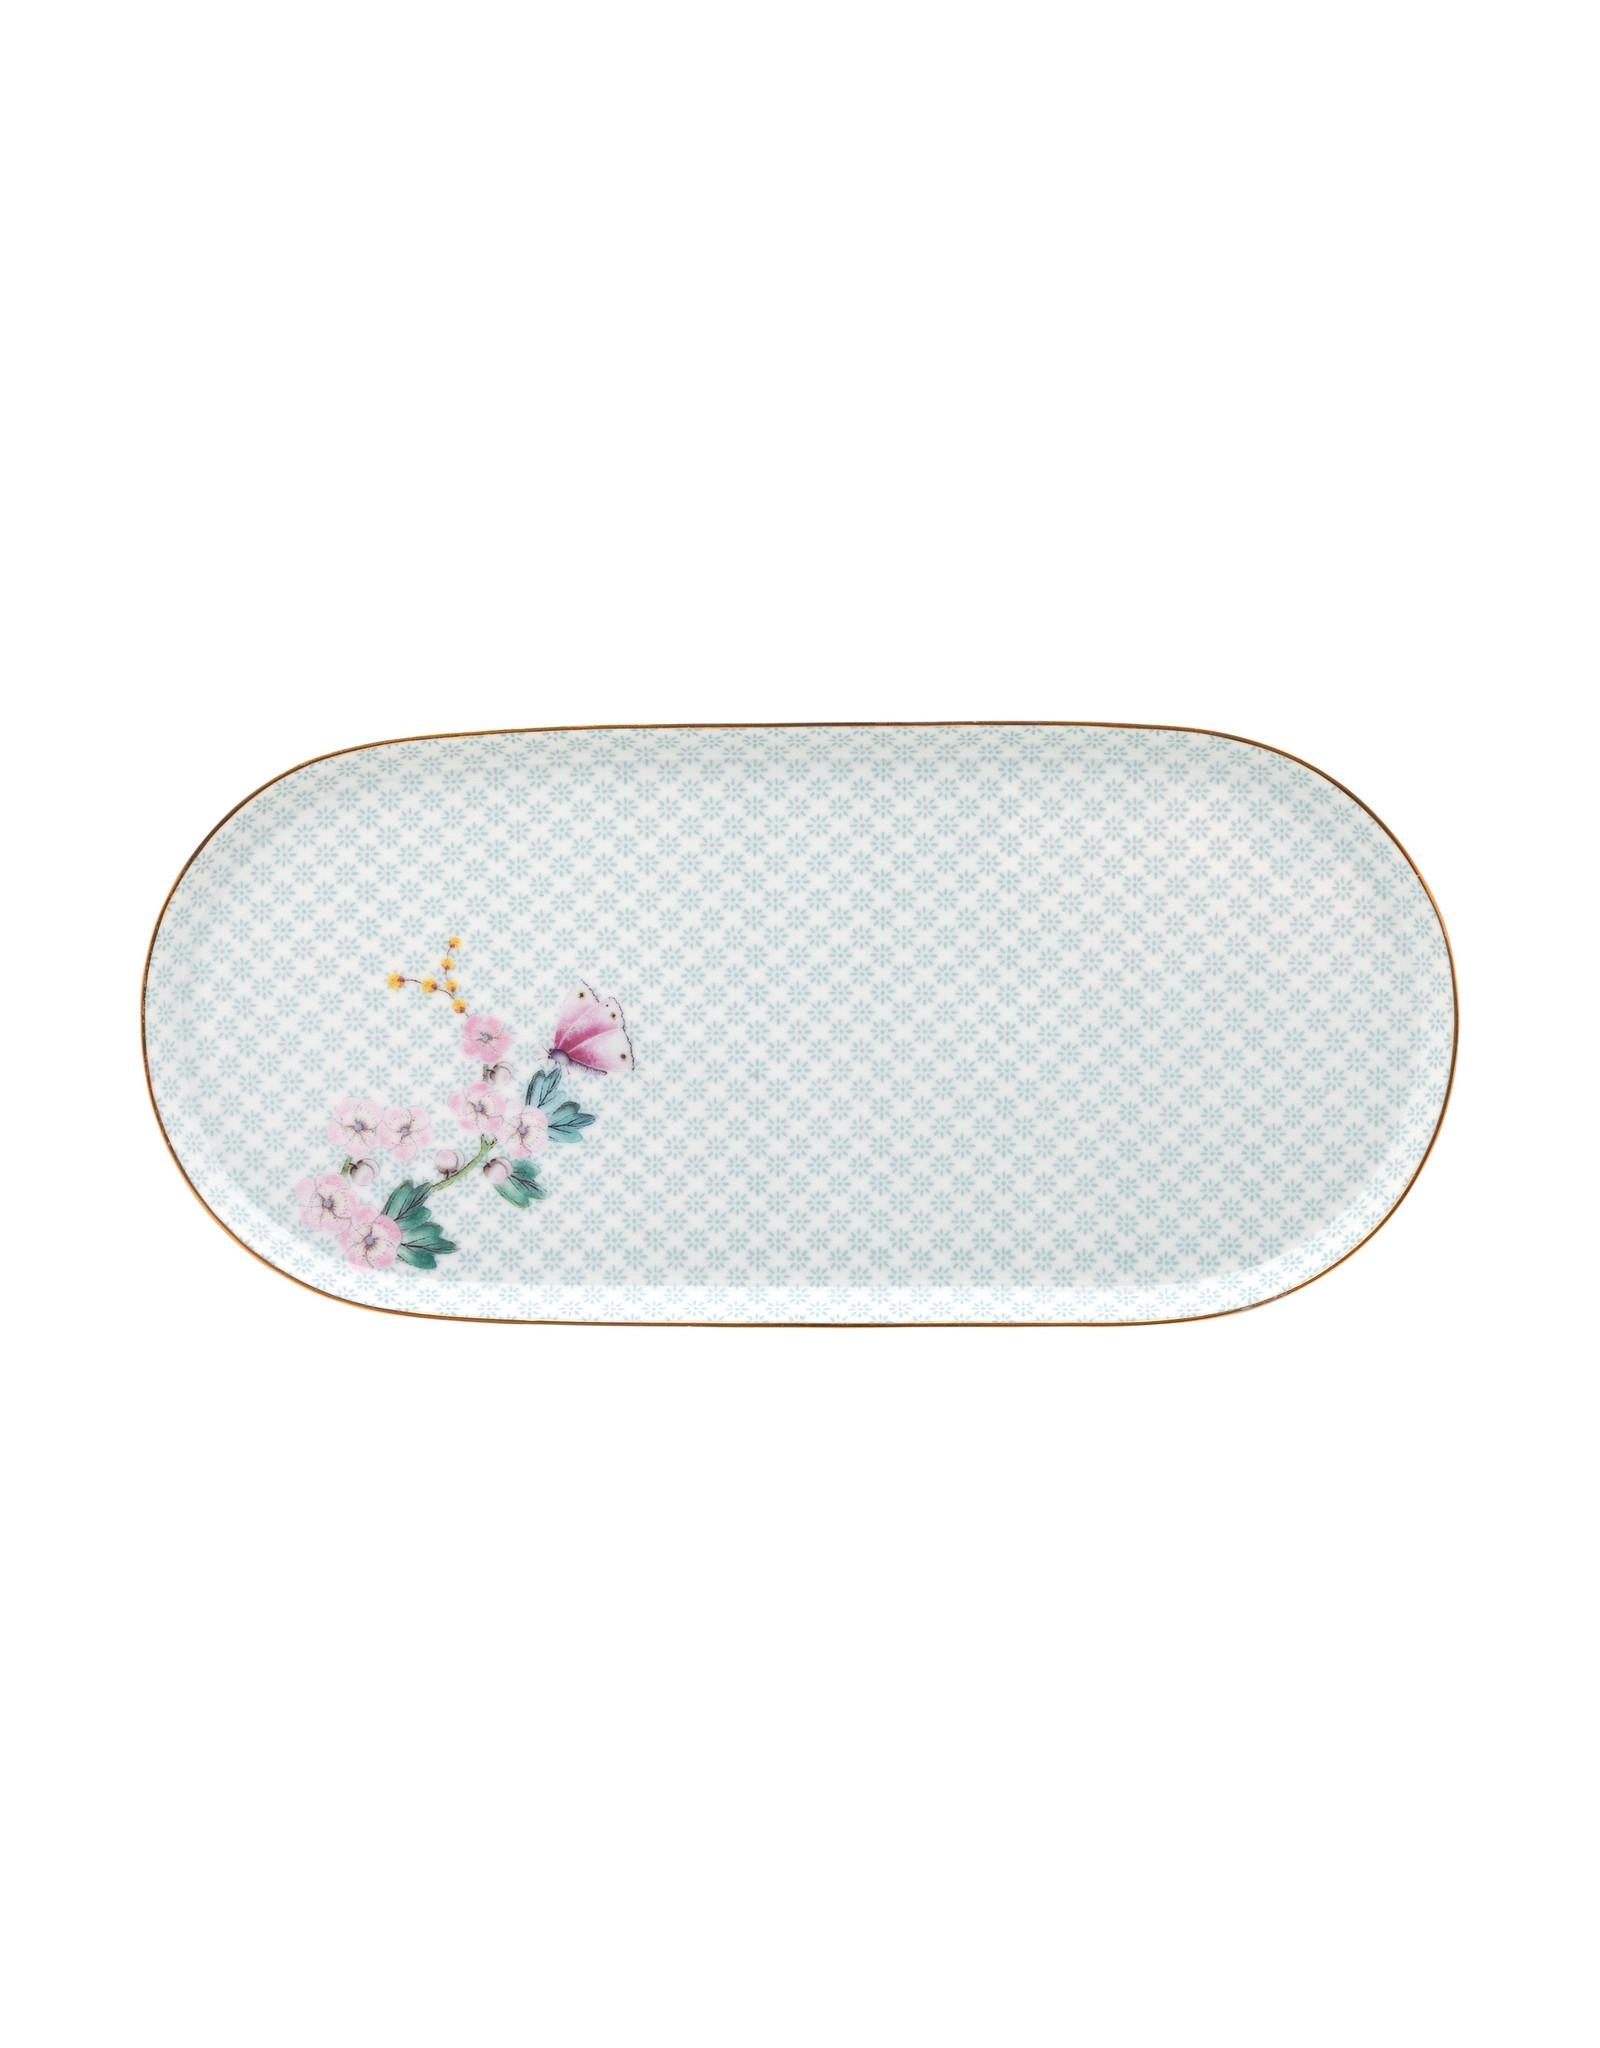 pip studio Plate Suger & Creamer Kamini White 25x12cm